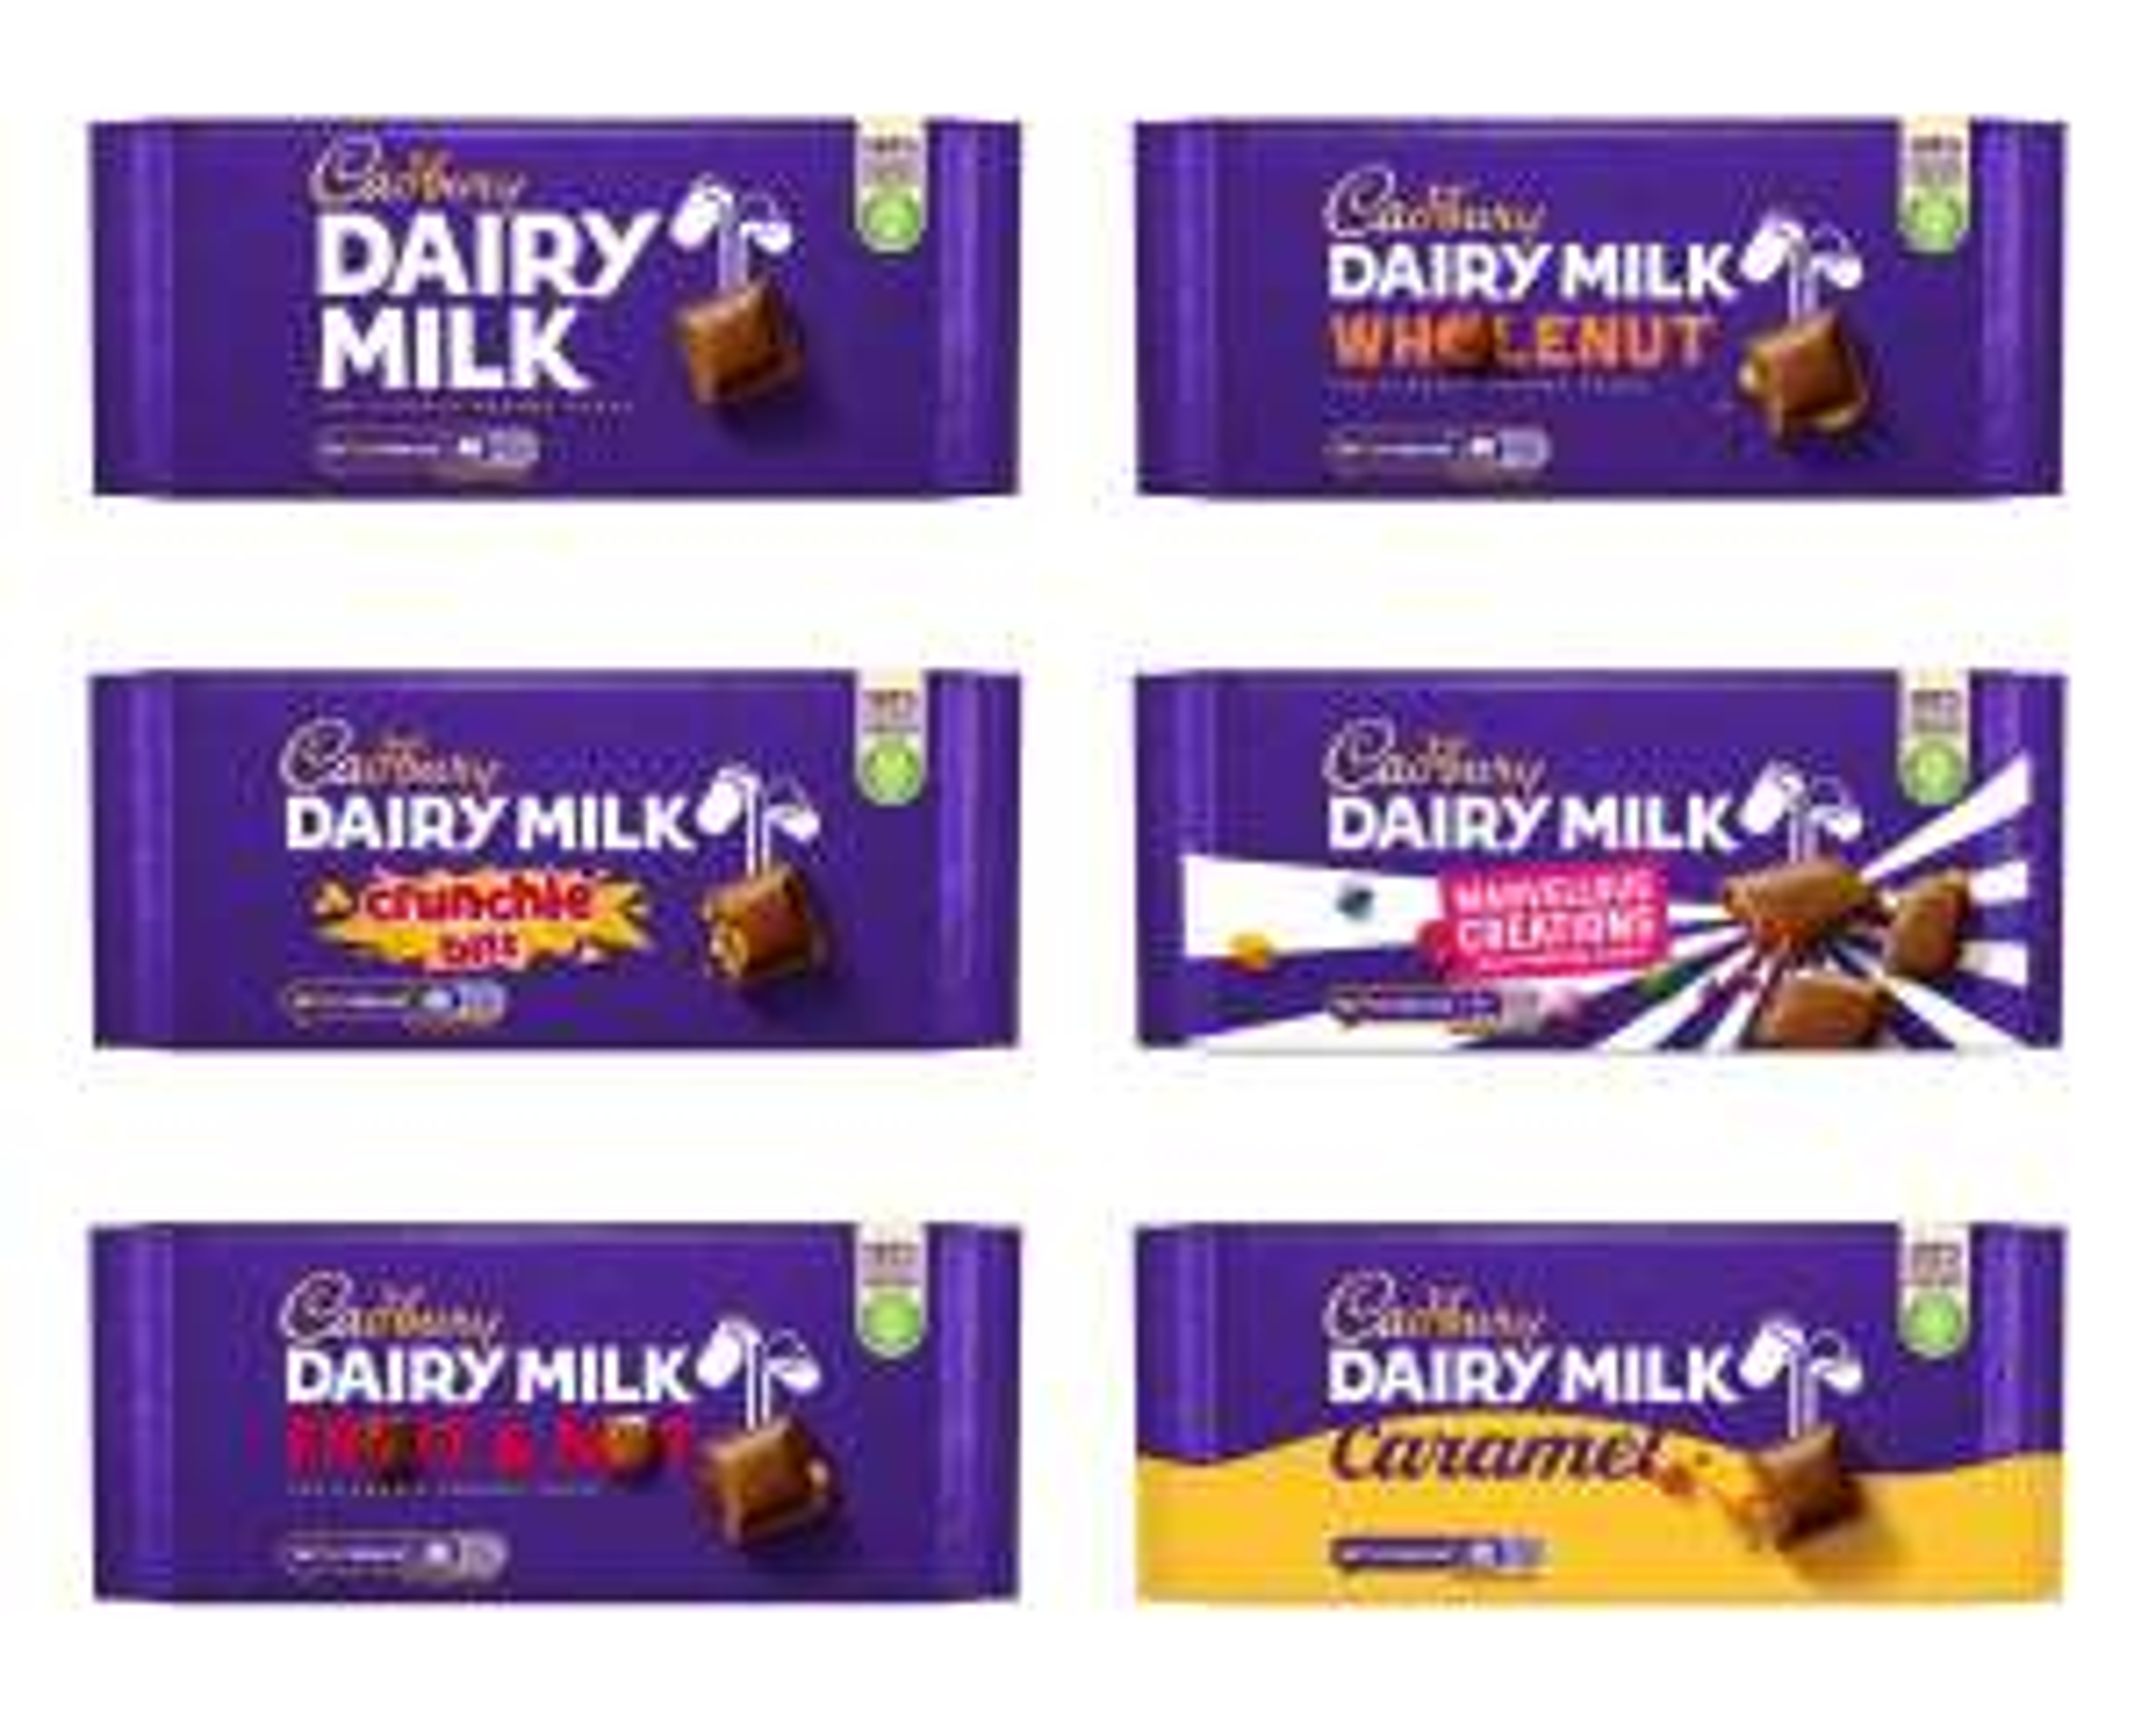 Cadbury Dairy Milk/ Fruit & nut/crunchie/whole nut/ caramel 200g/marvellous creations 180g - £1.50 @ Morrisons